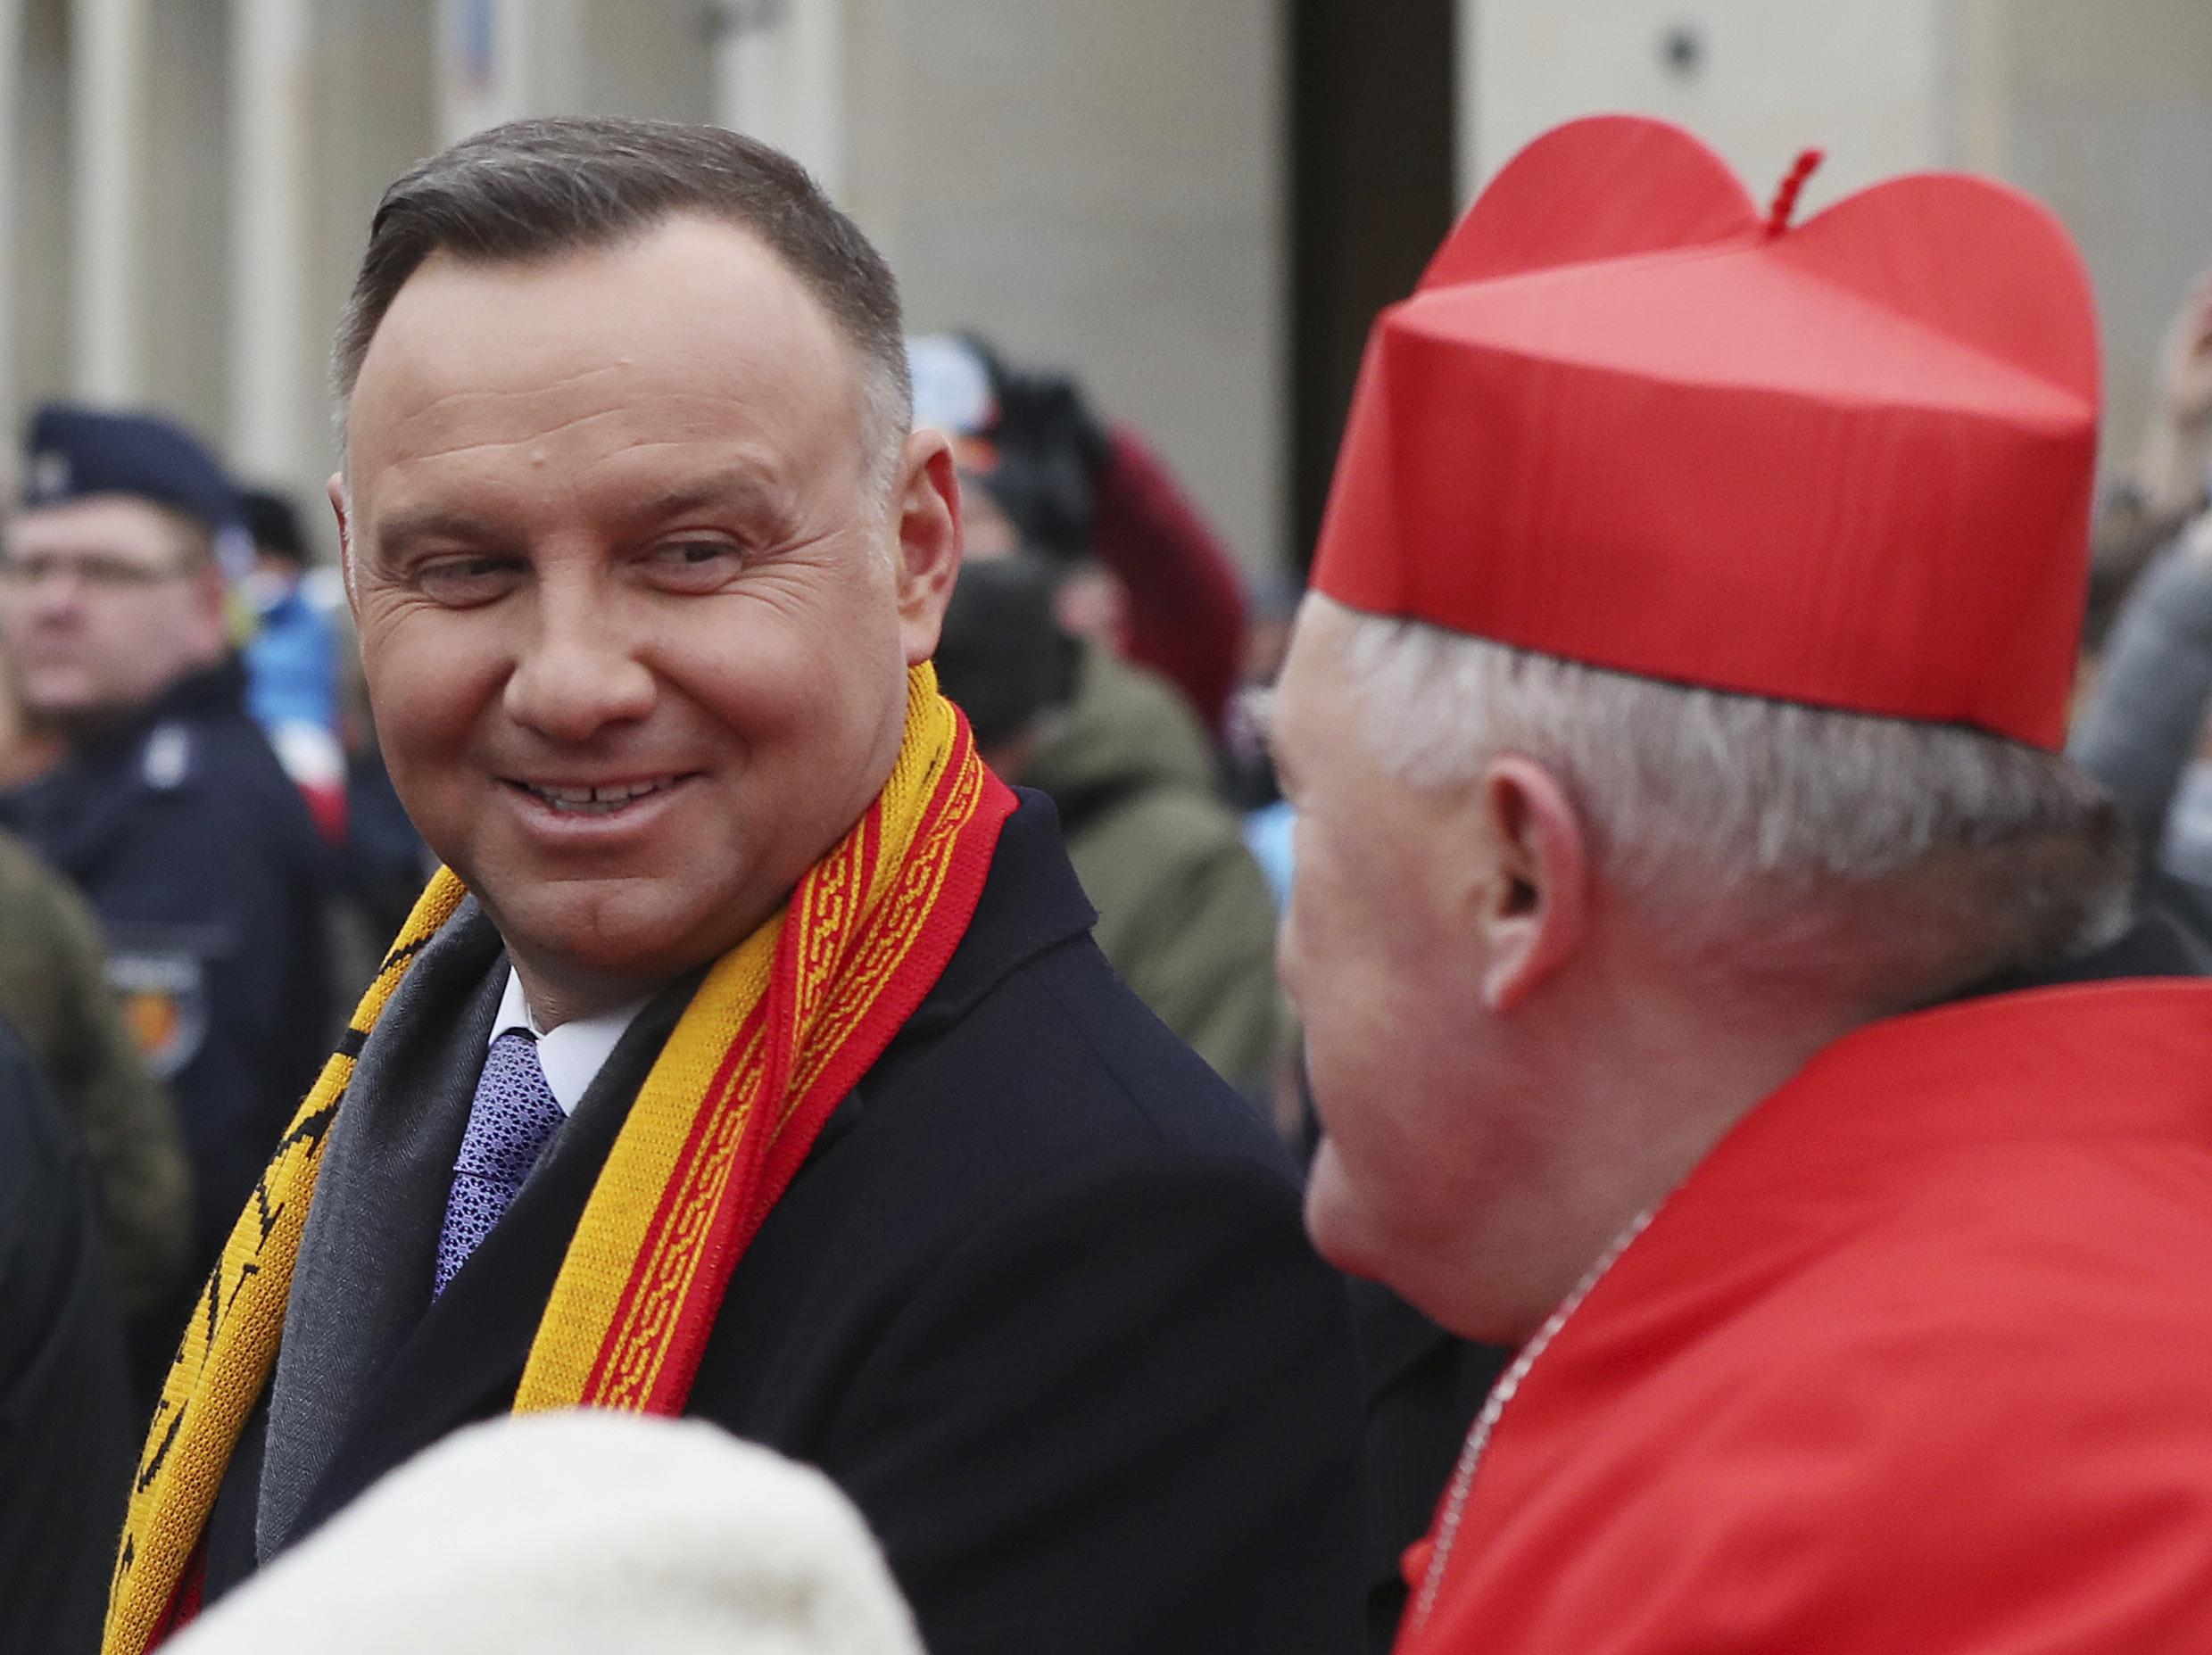 Polish president boycotts Holocaust remembrance in Israel